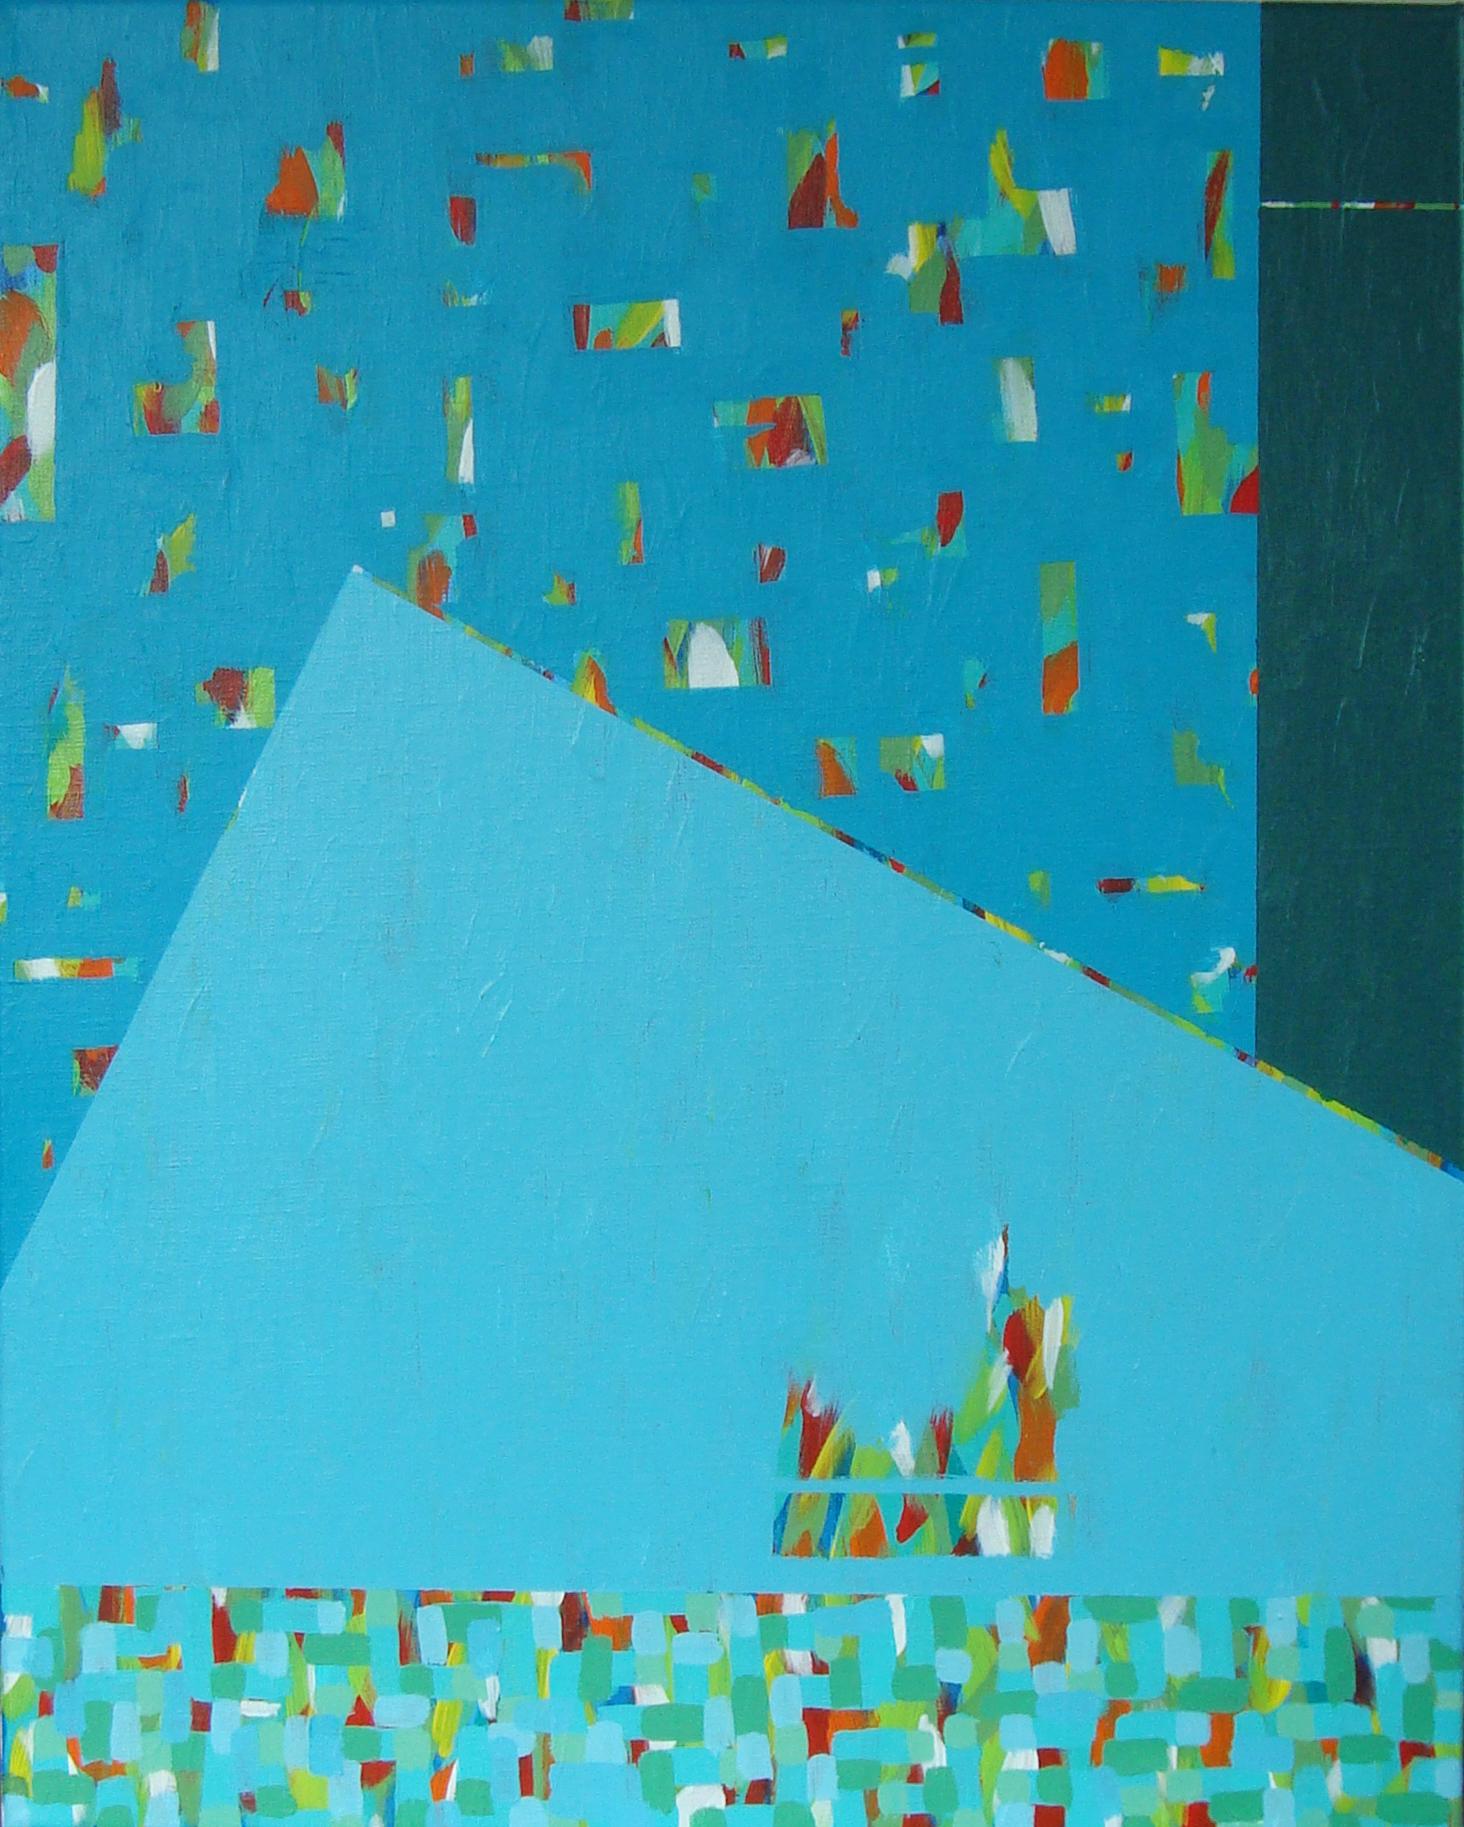 "STACCATO II, acrylic on canvas, 20"" x 16"", 2016"